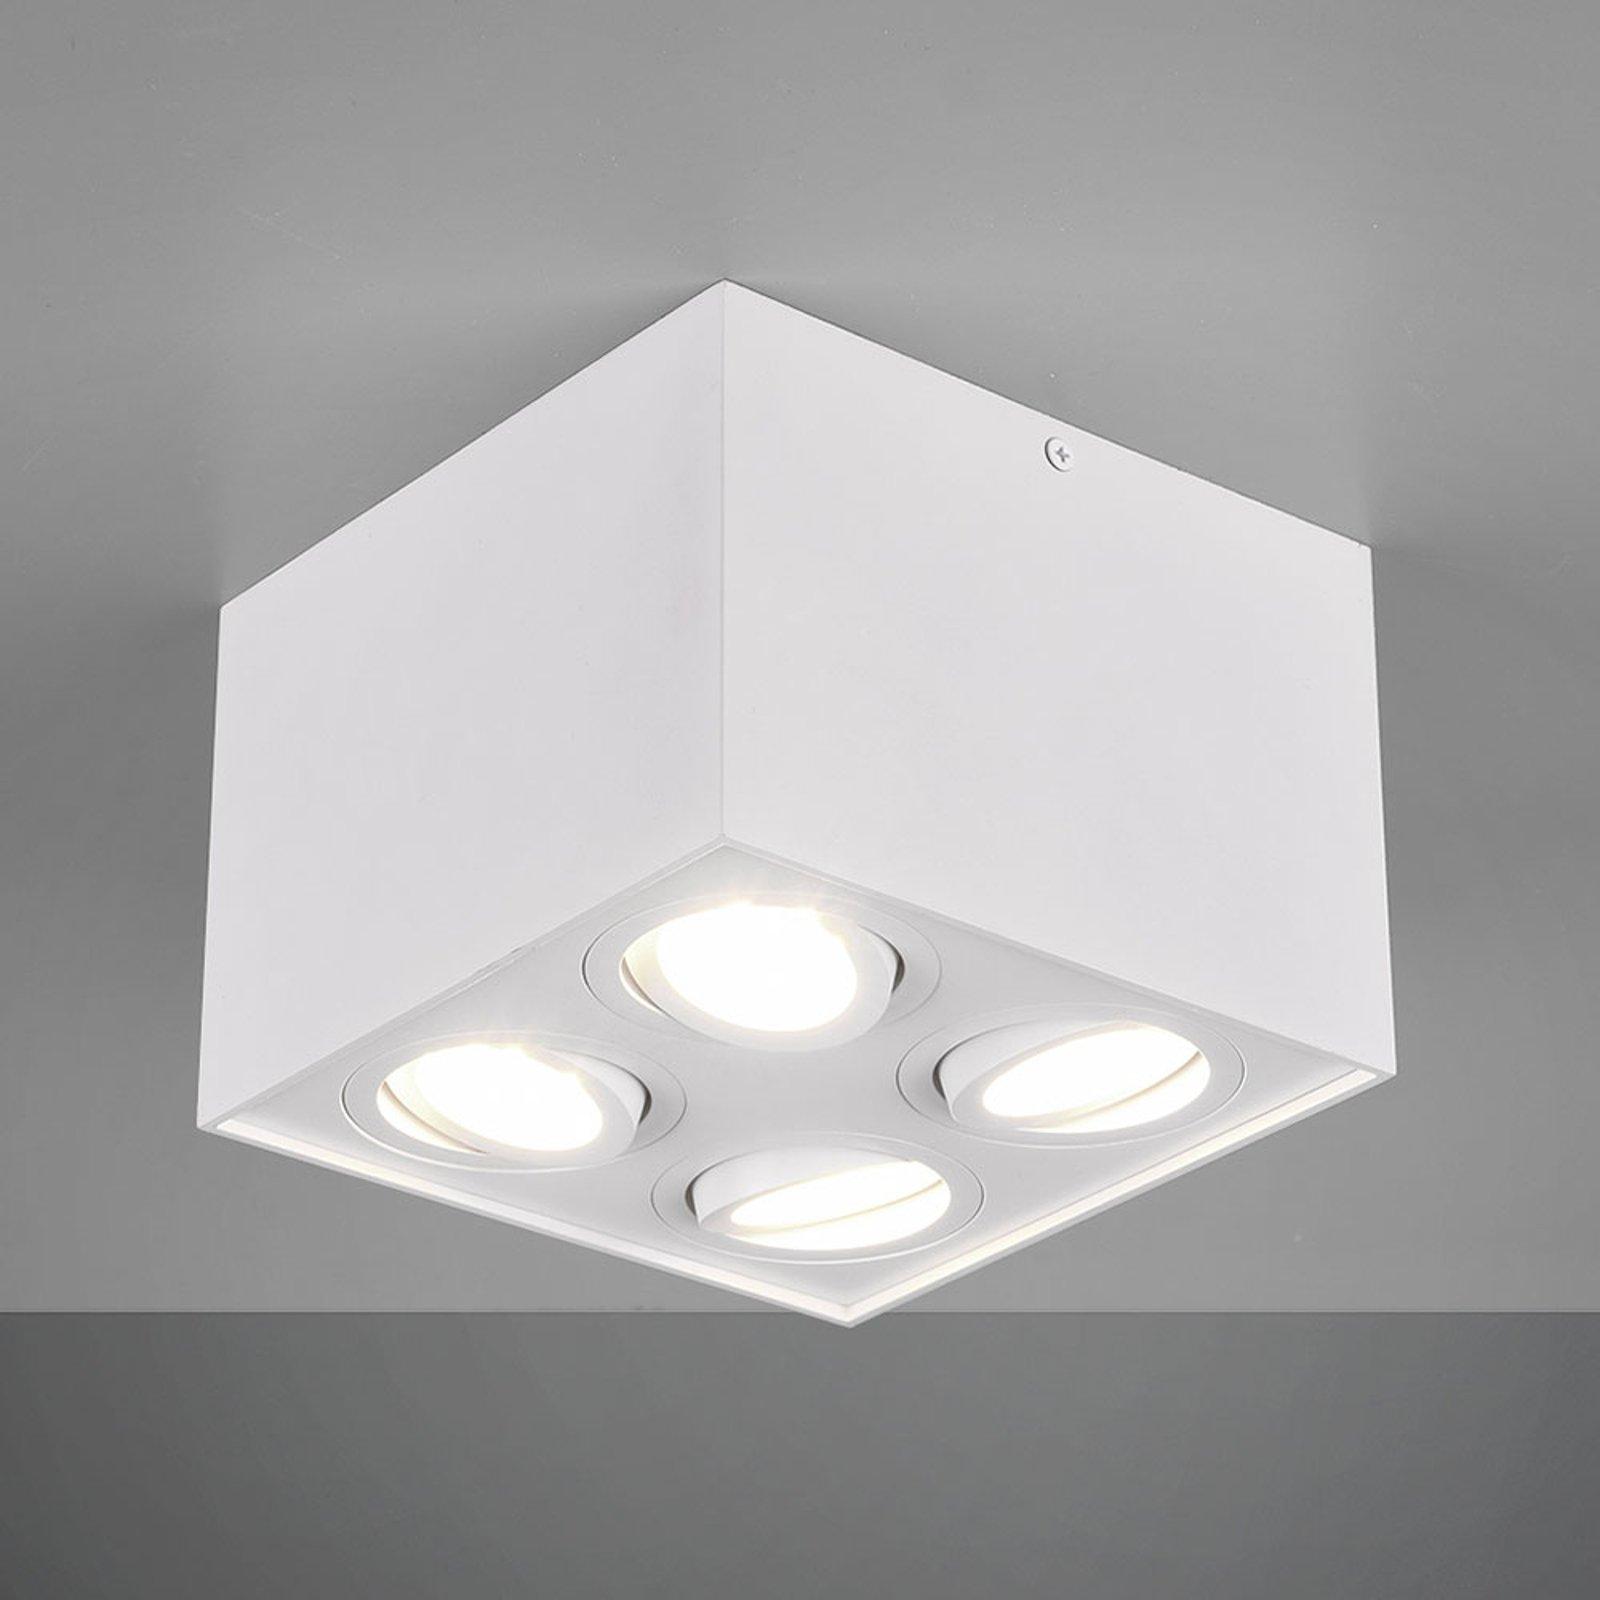 Taklampe Biscuit, 4 lyskilder, hvit